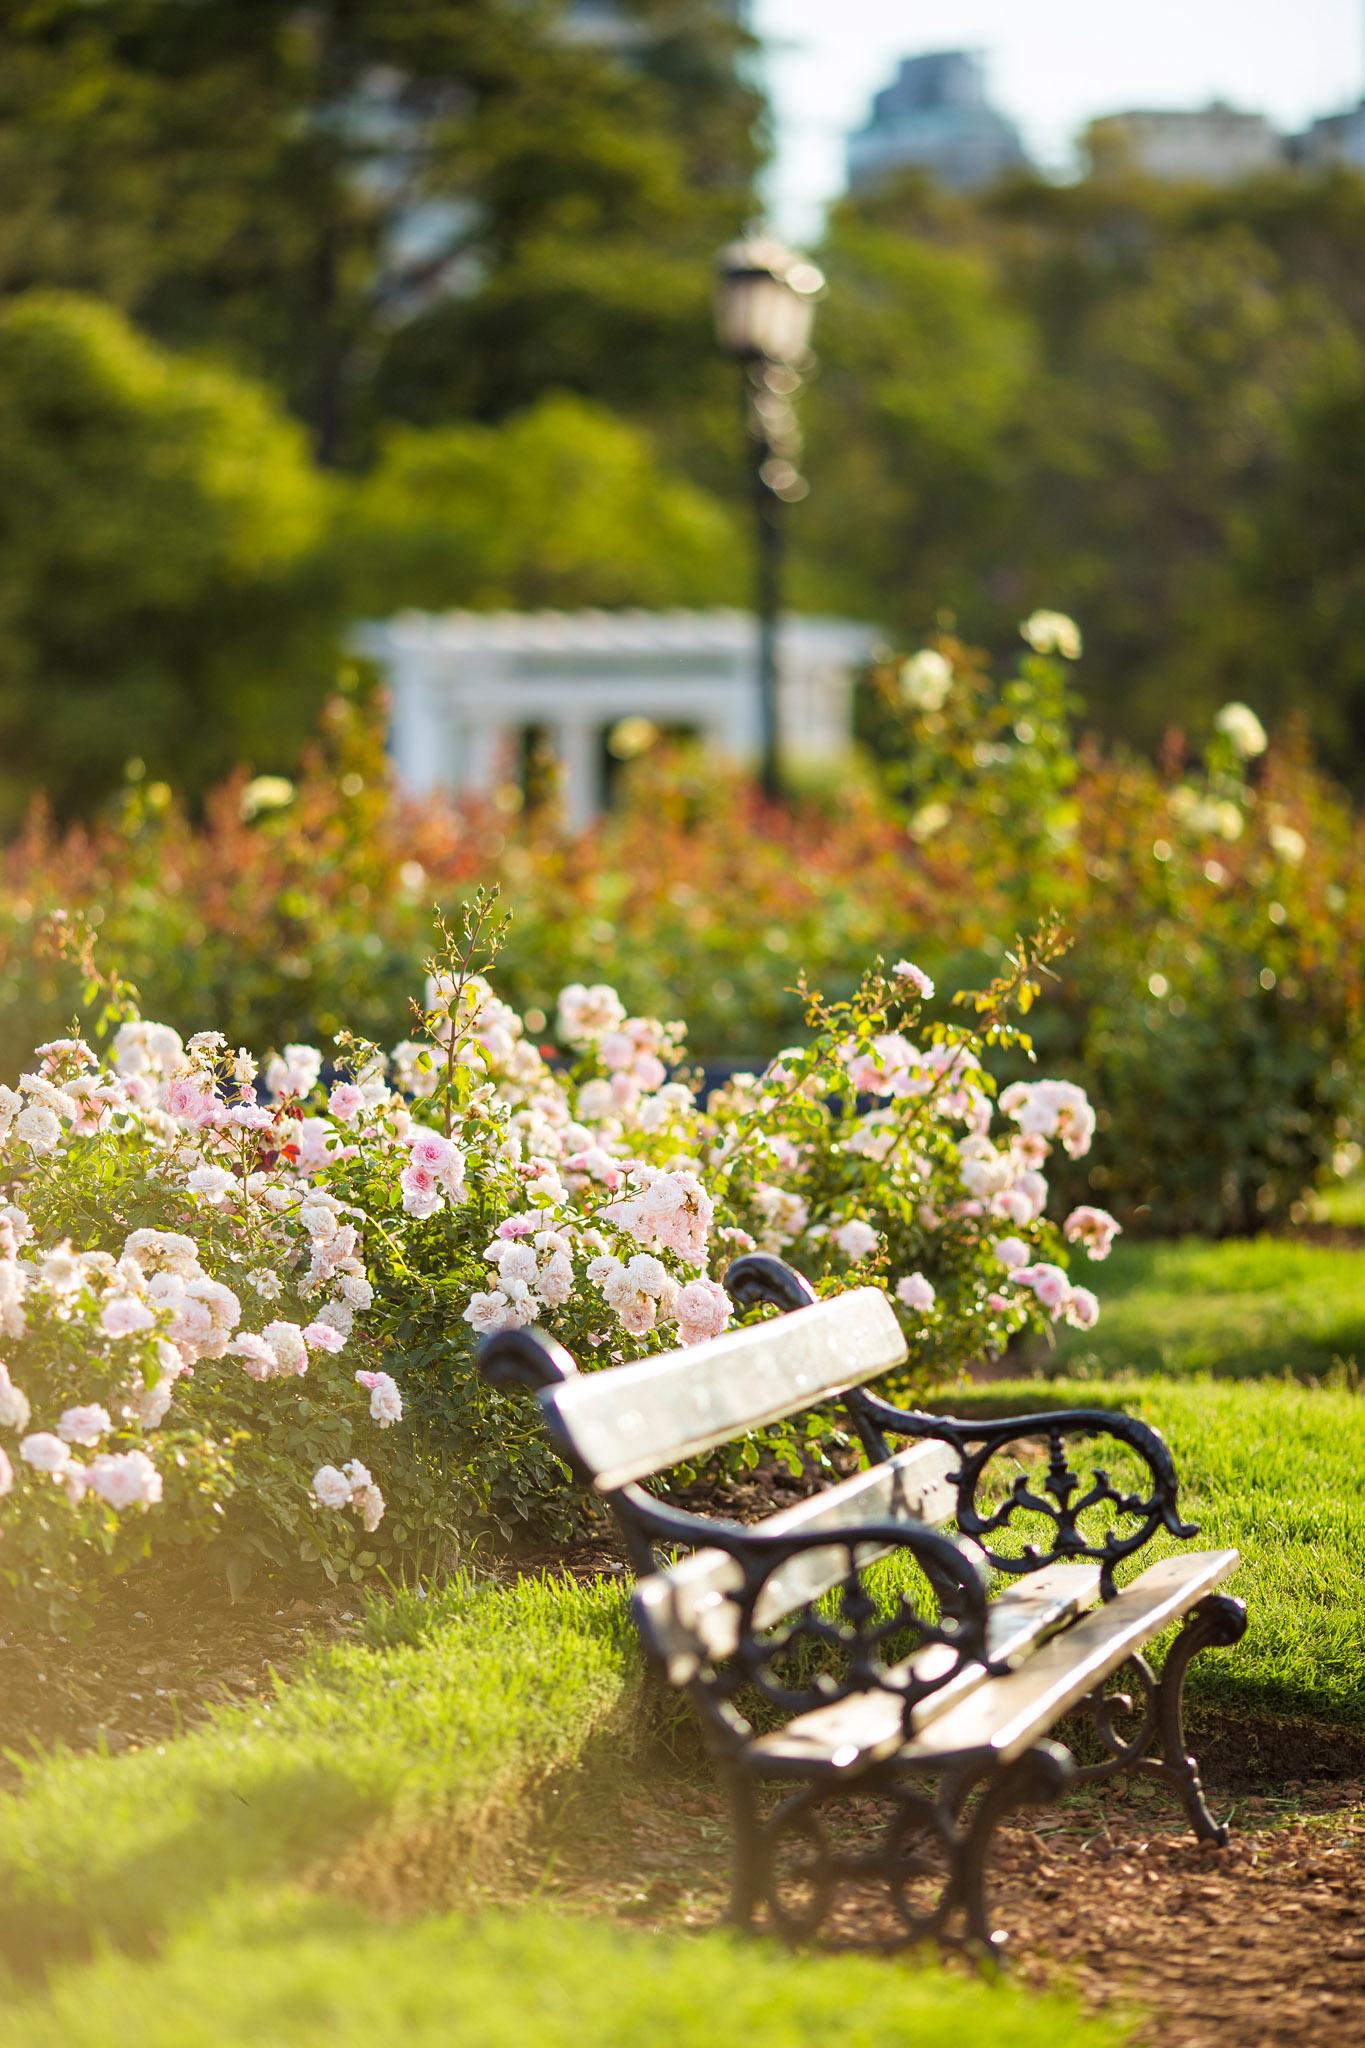 Wedding-travellers-Argentina-Buenos-Aires-Botanical-Garden-Jardin-Botanico-Rosario-Rose-Bench